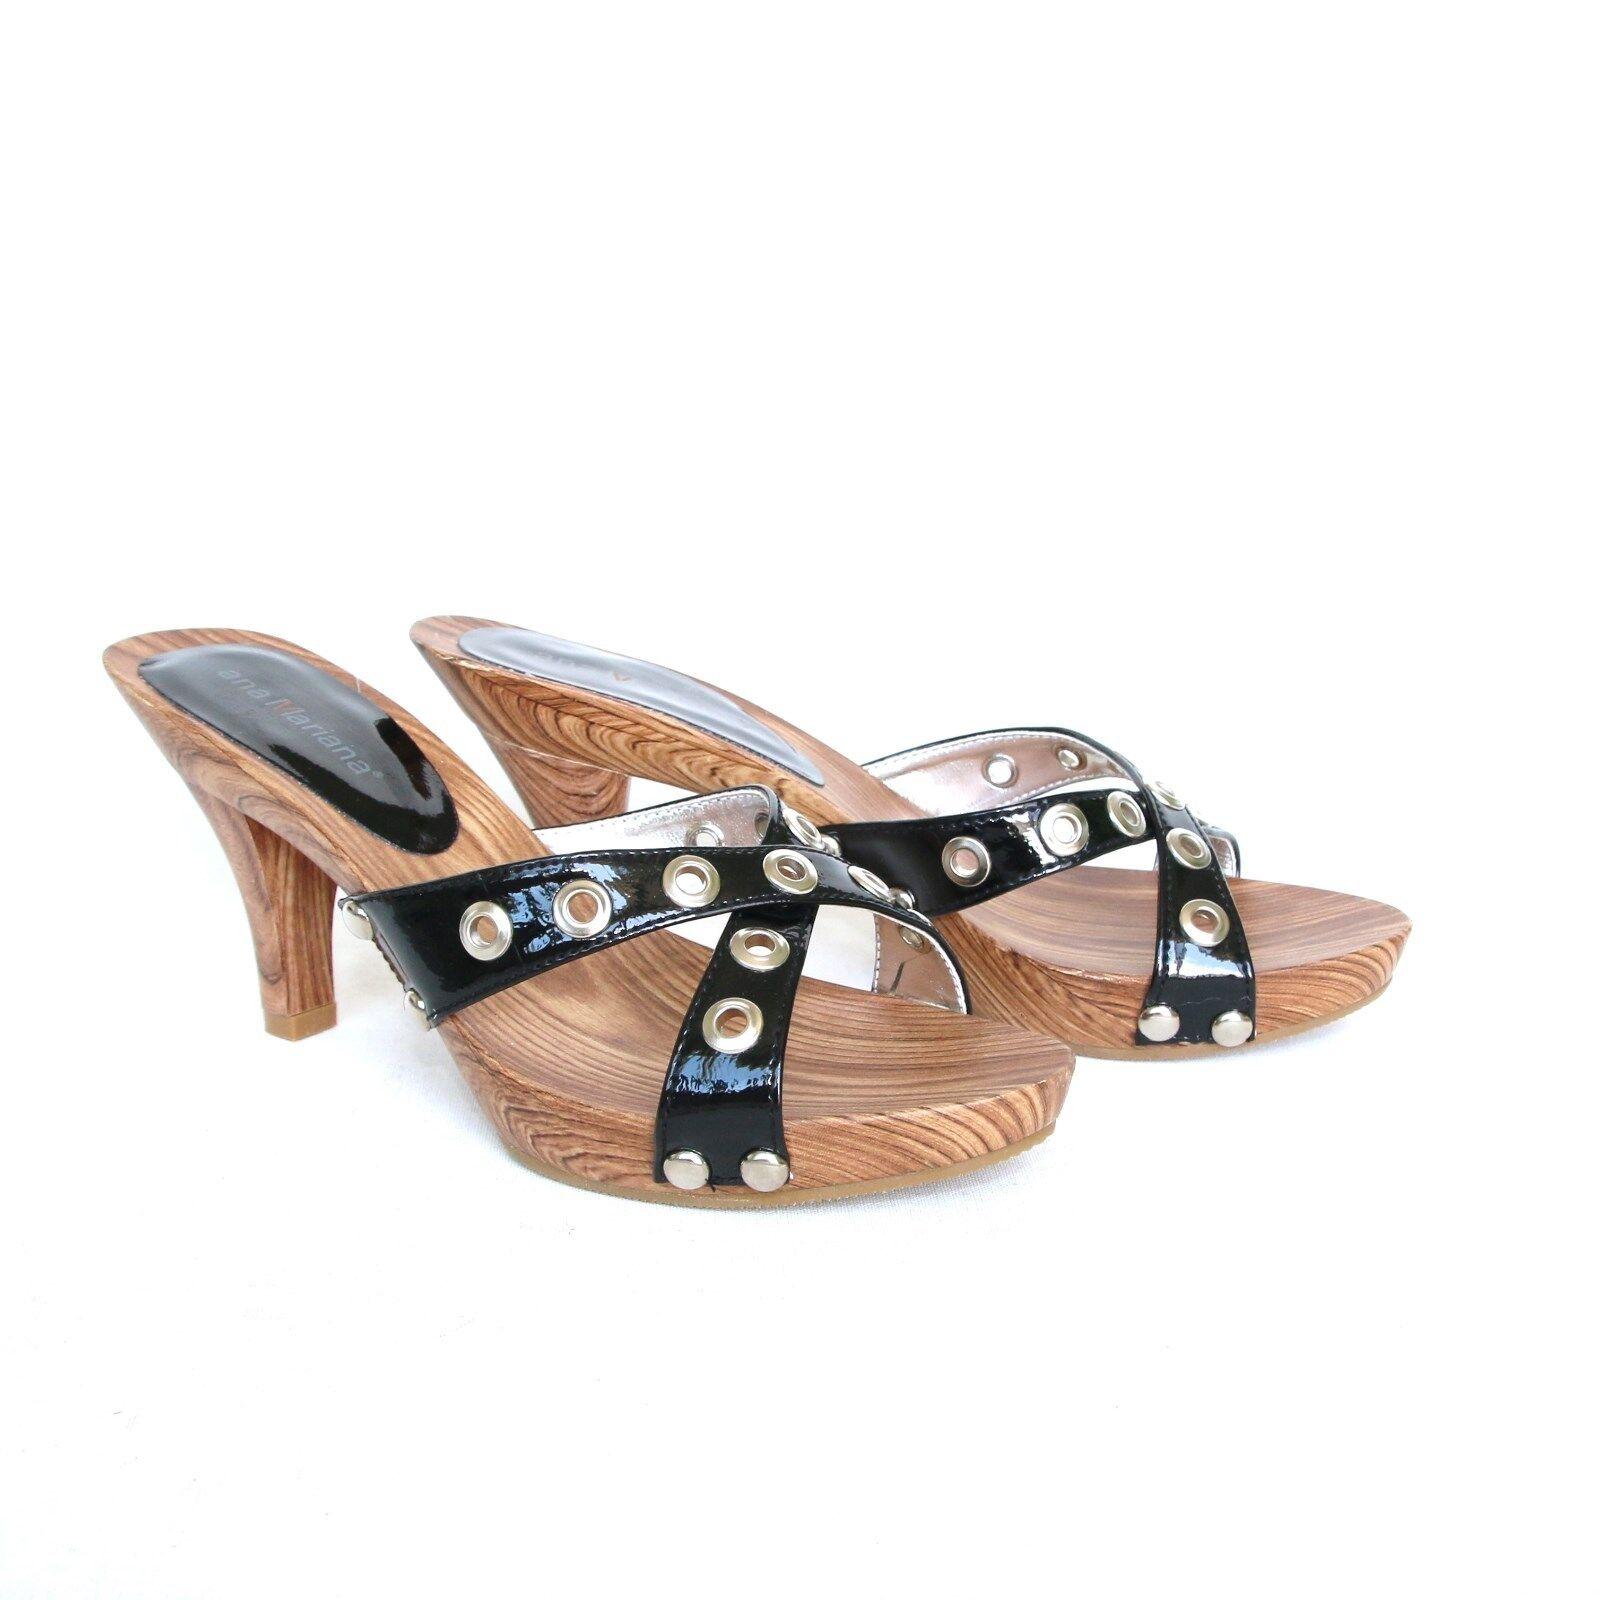 Moda jest prosta i niedroga Damen Riemchen Sandaletten 38 Schwarz Sandalen Pumps High Heels Holzoptik S .